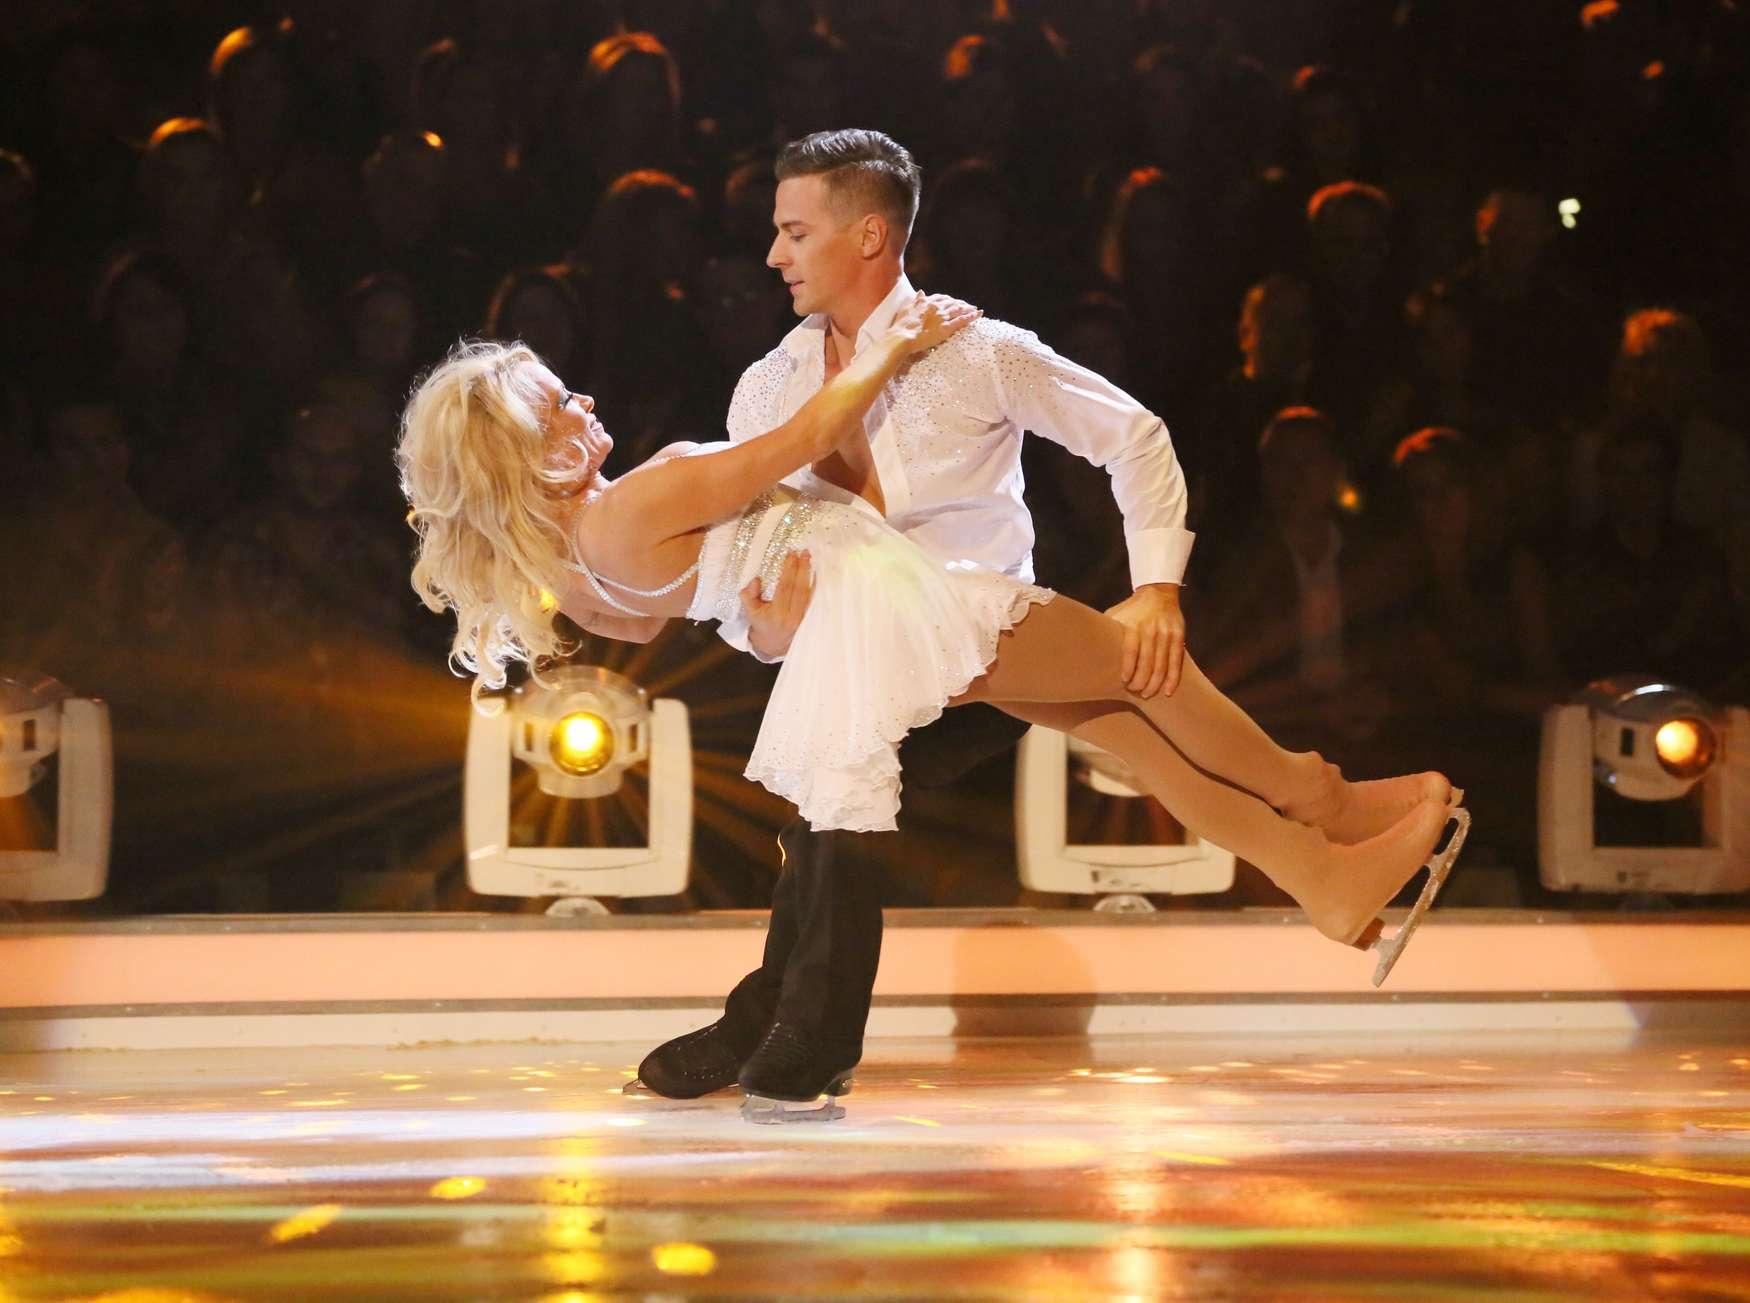 pamela anderson � dancing on ice uk 10 � gotceleb